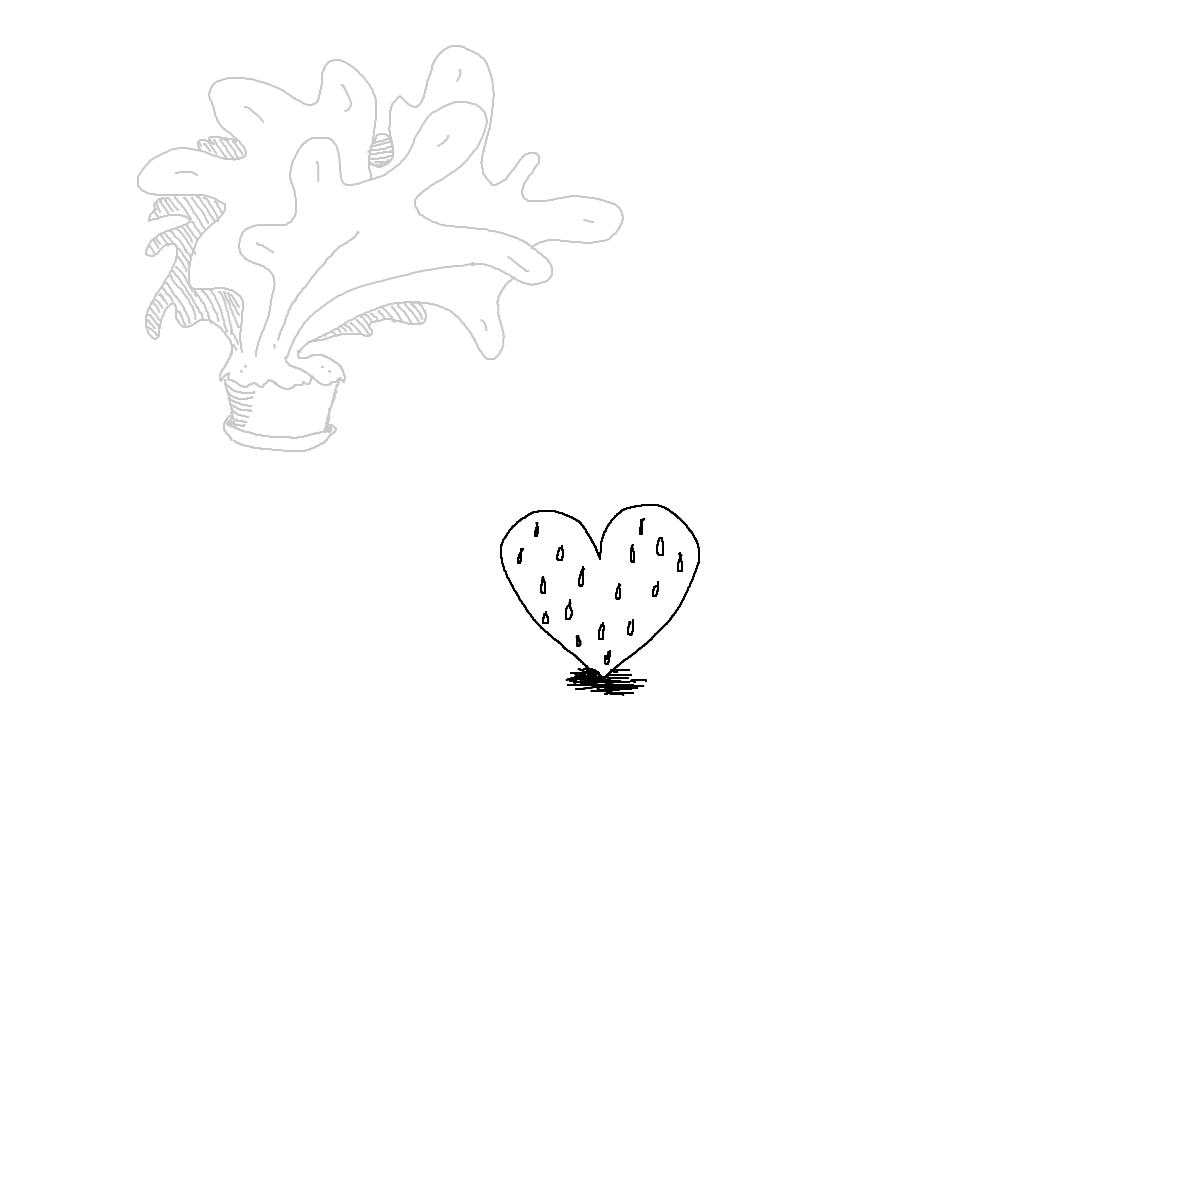 BAAAM drawing#19365 lat:52.0876007080078100lng: 4.3382086753845215